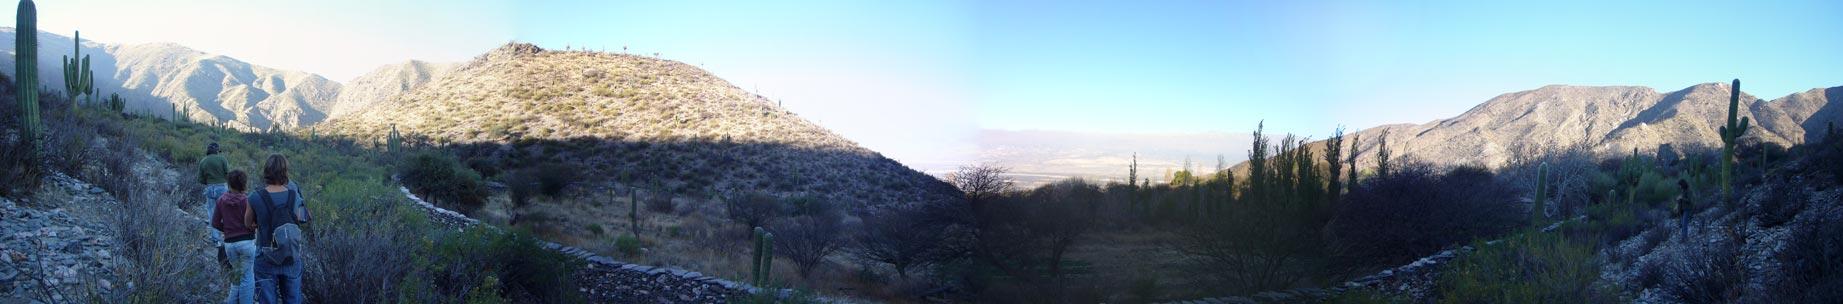 panoramiquepichao2.jpg